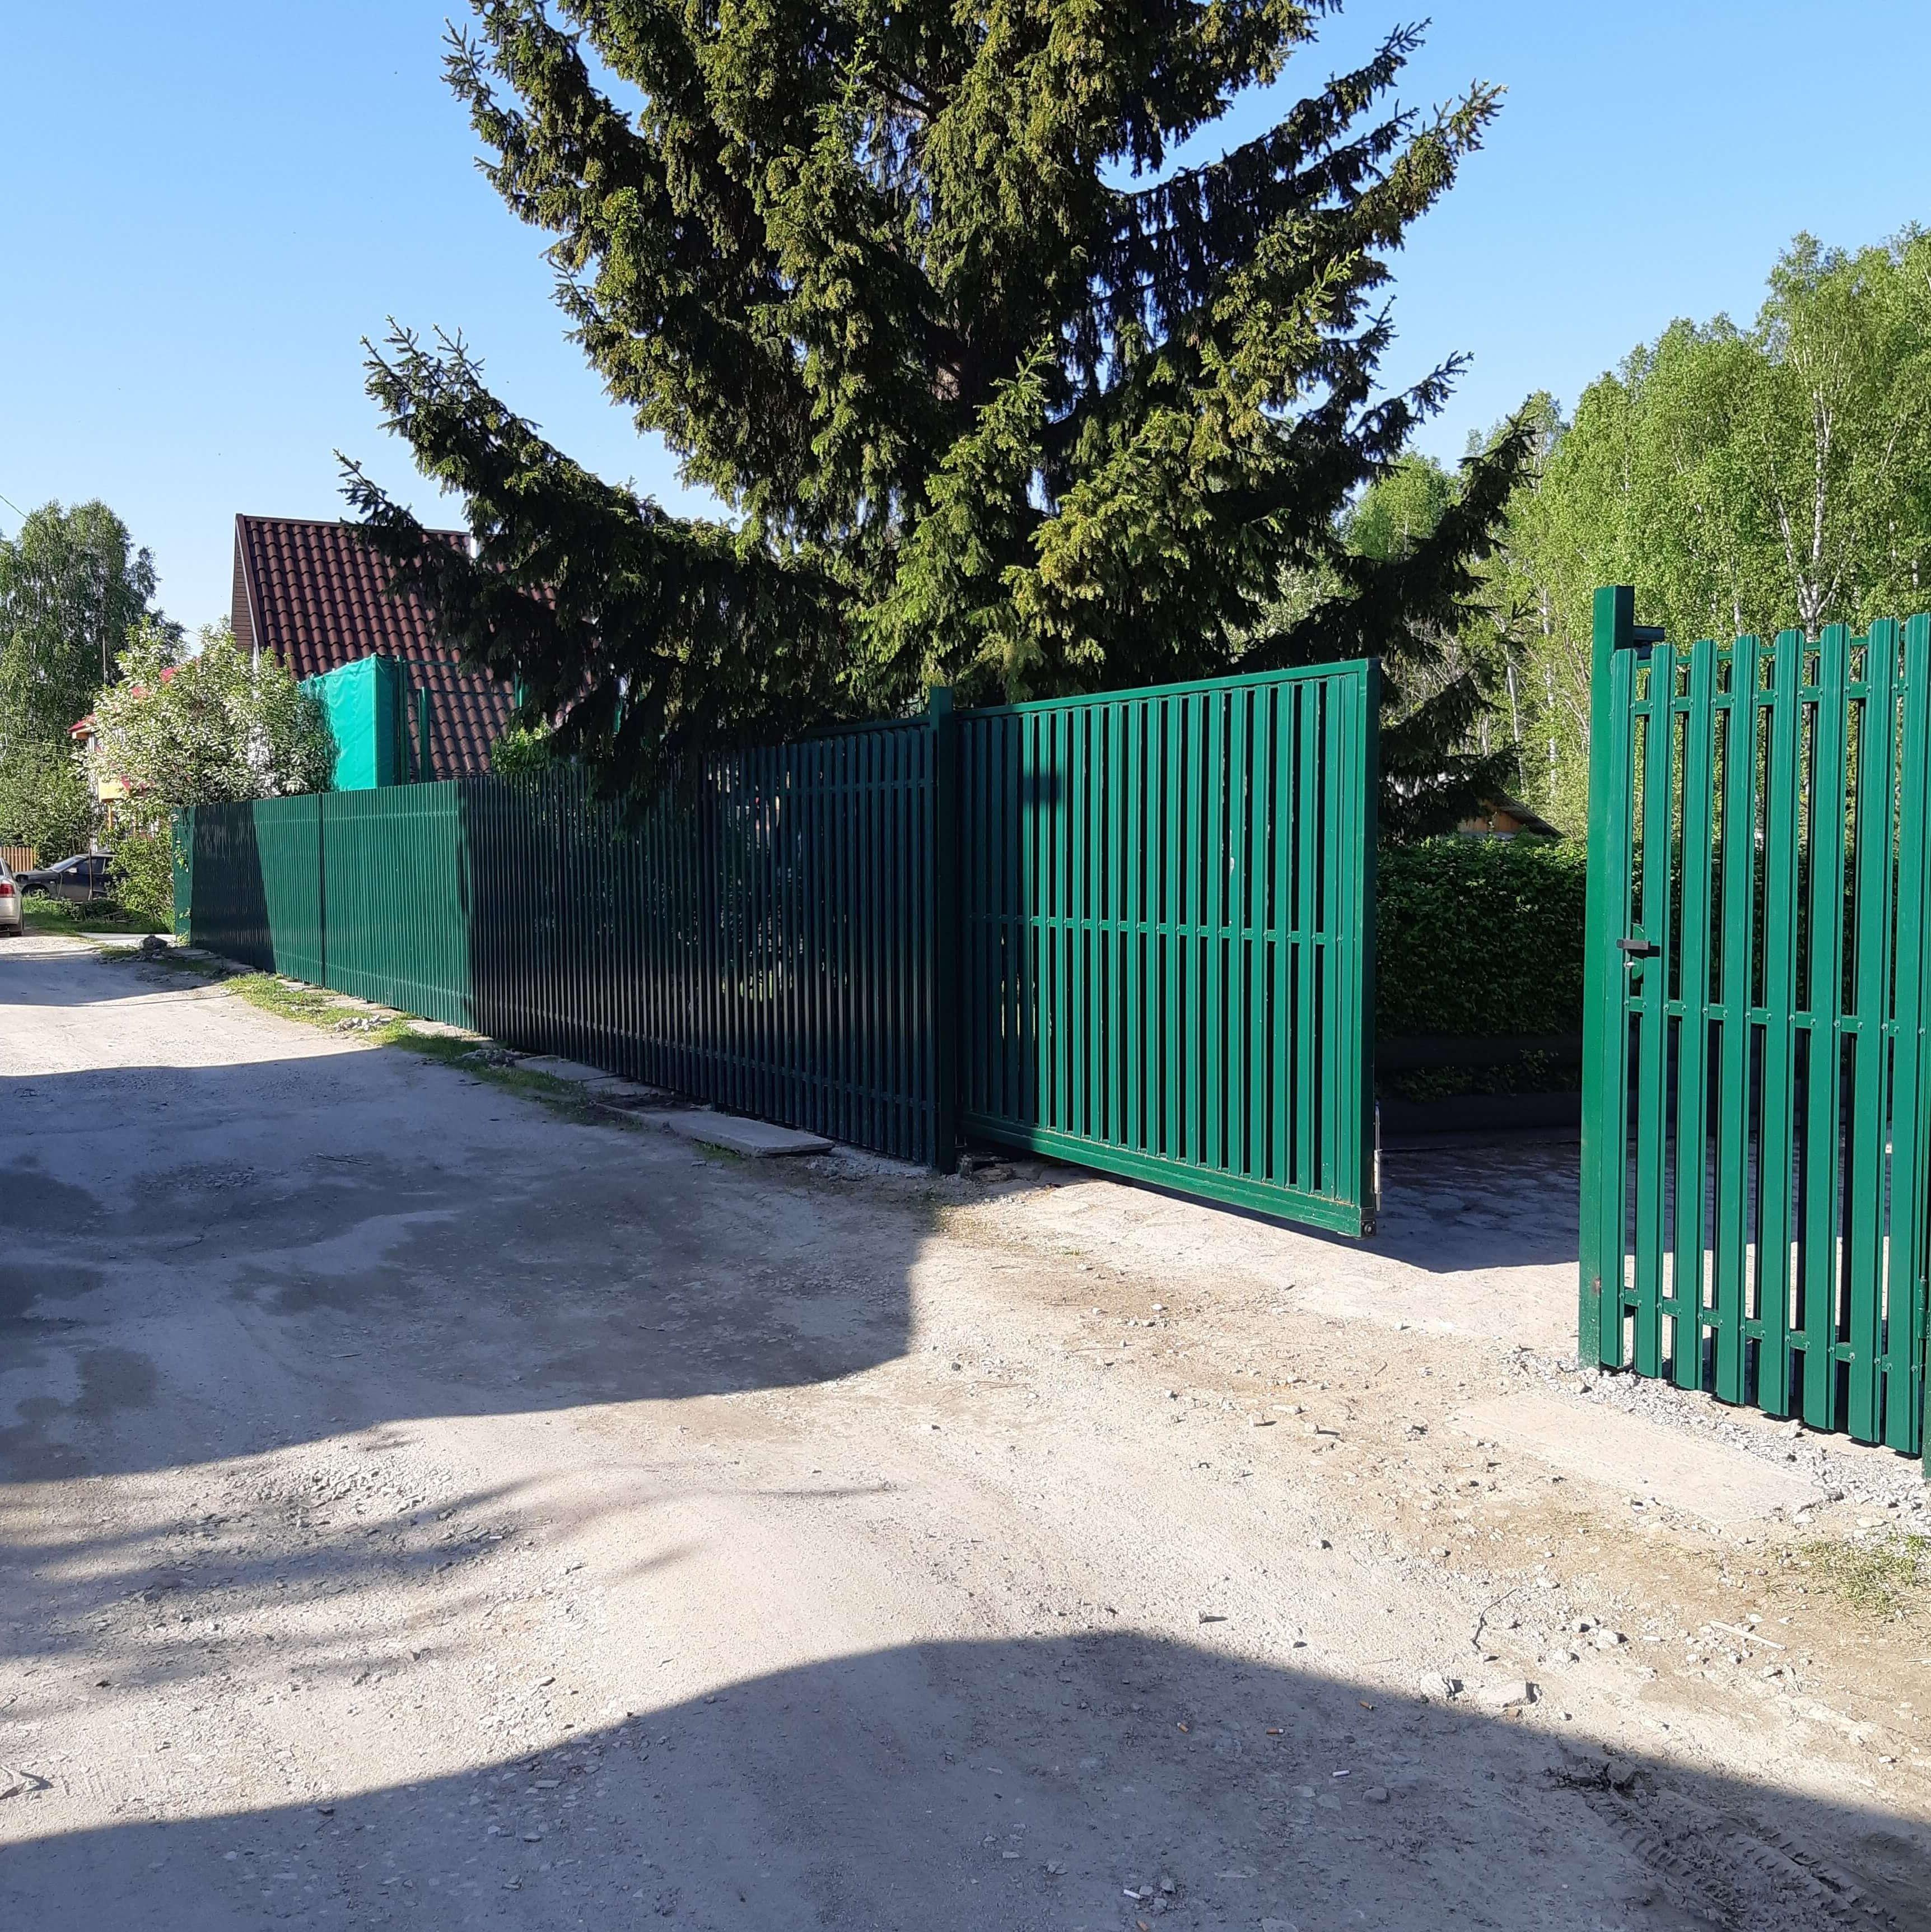 Забор и штакетника с воротами